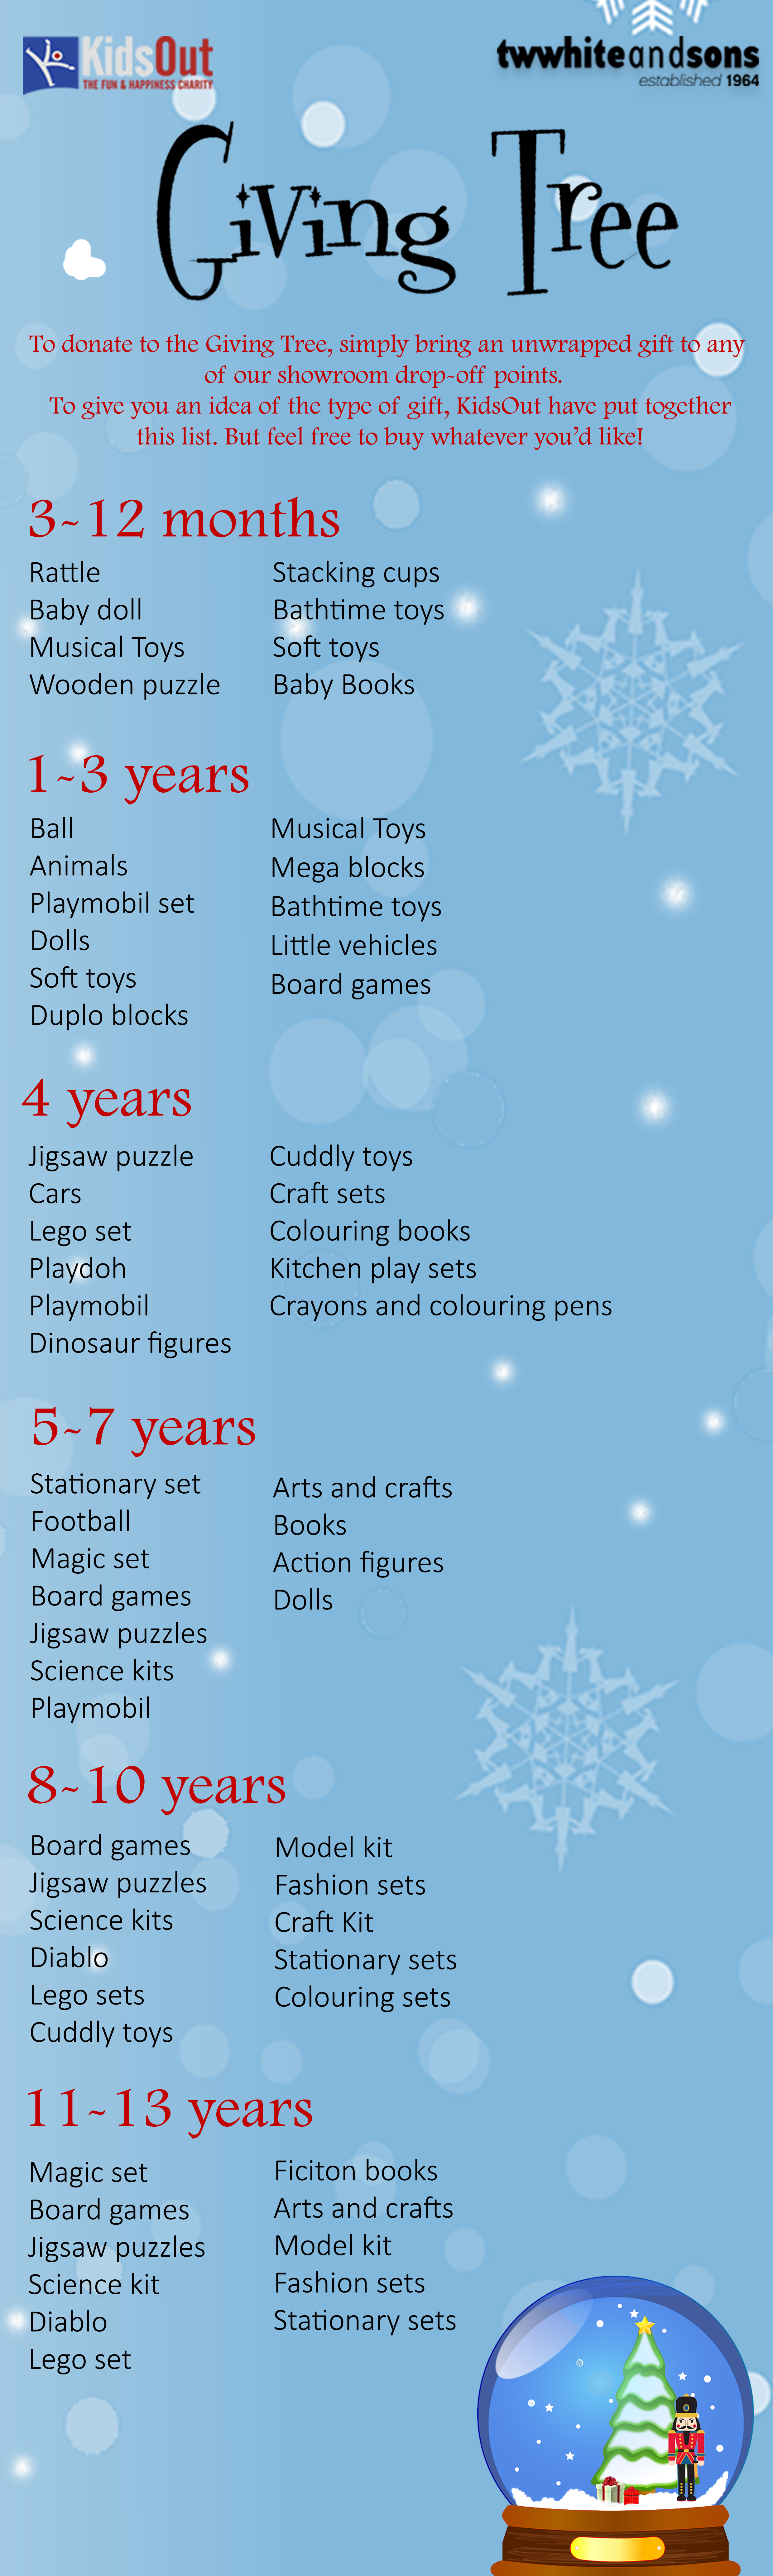 Giving Tree gift ideas list